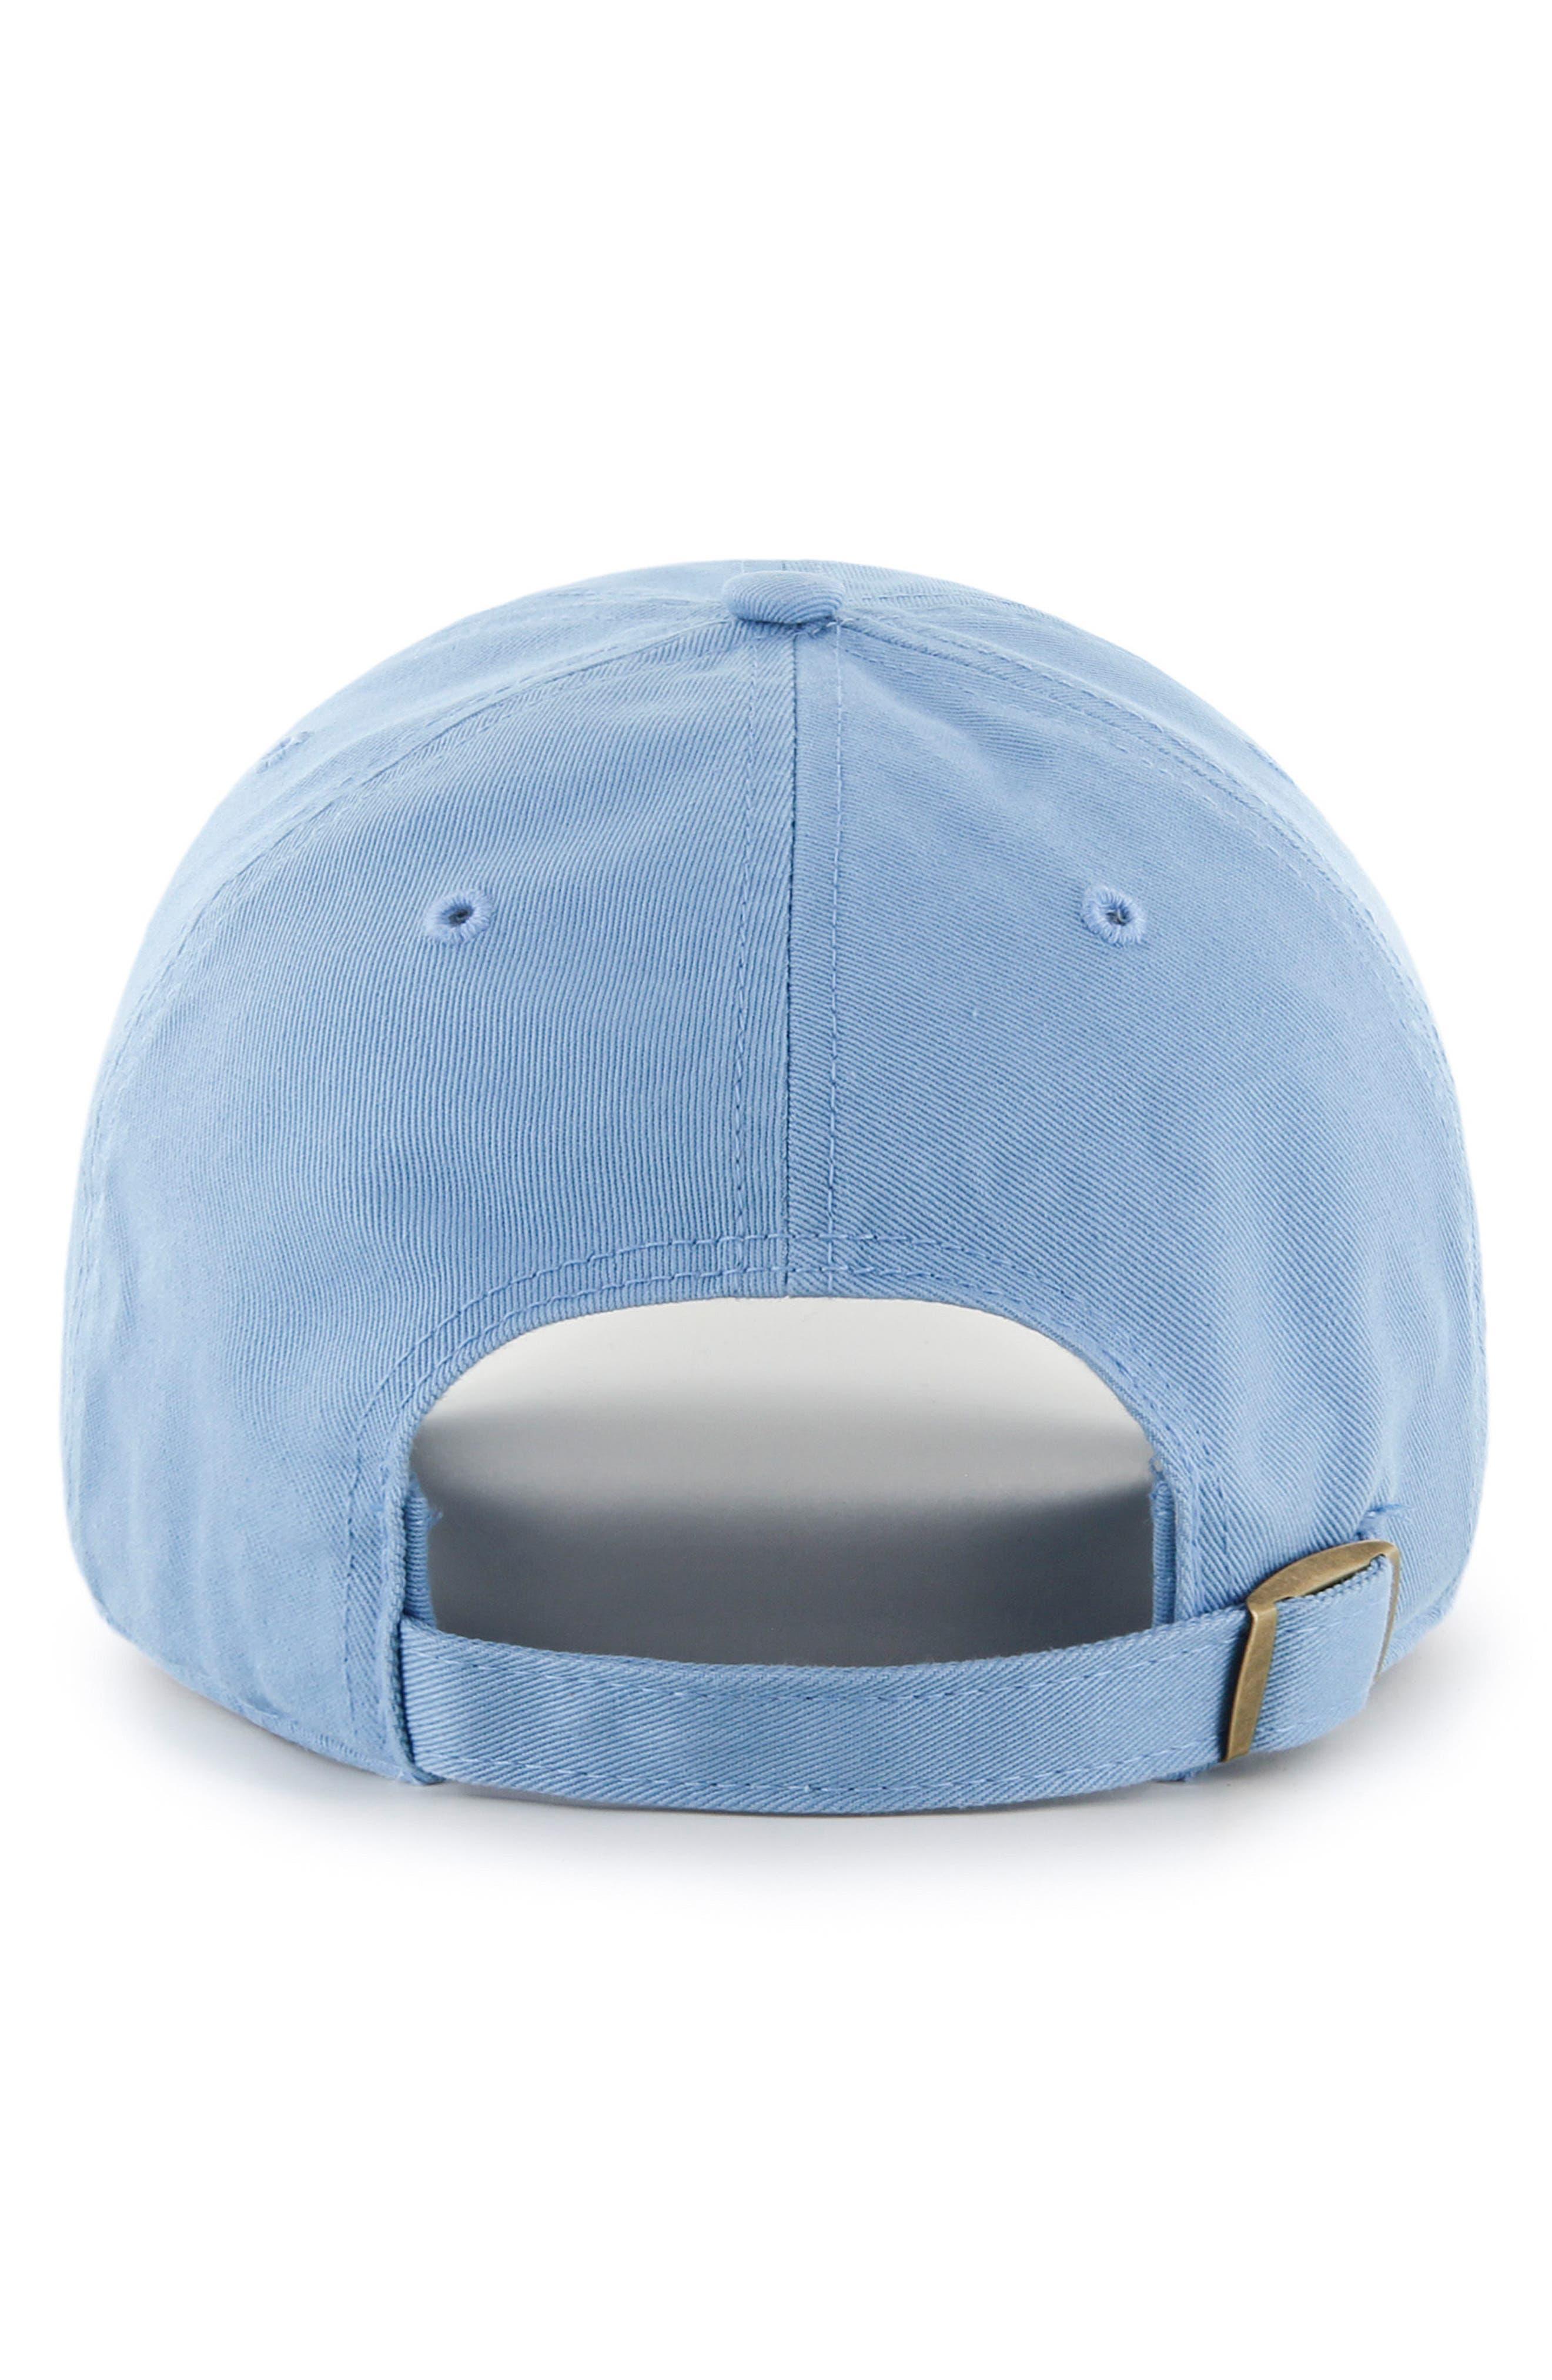 MLB Cooperstown Logo Ball Cap,                             Alternate thumbnail 26, color,